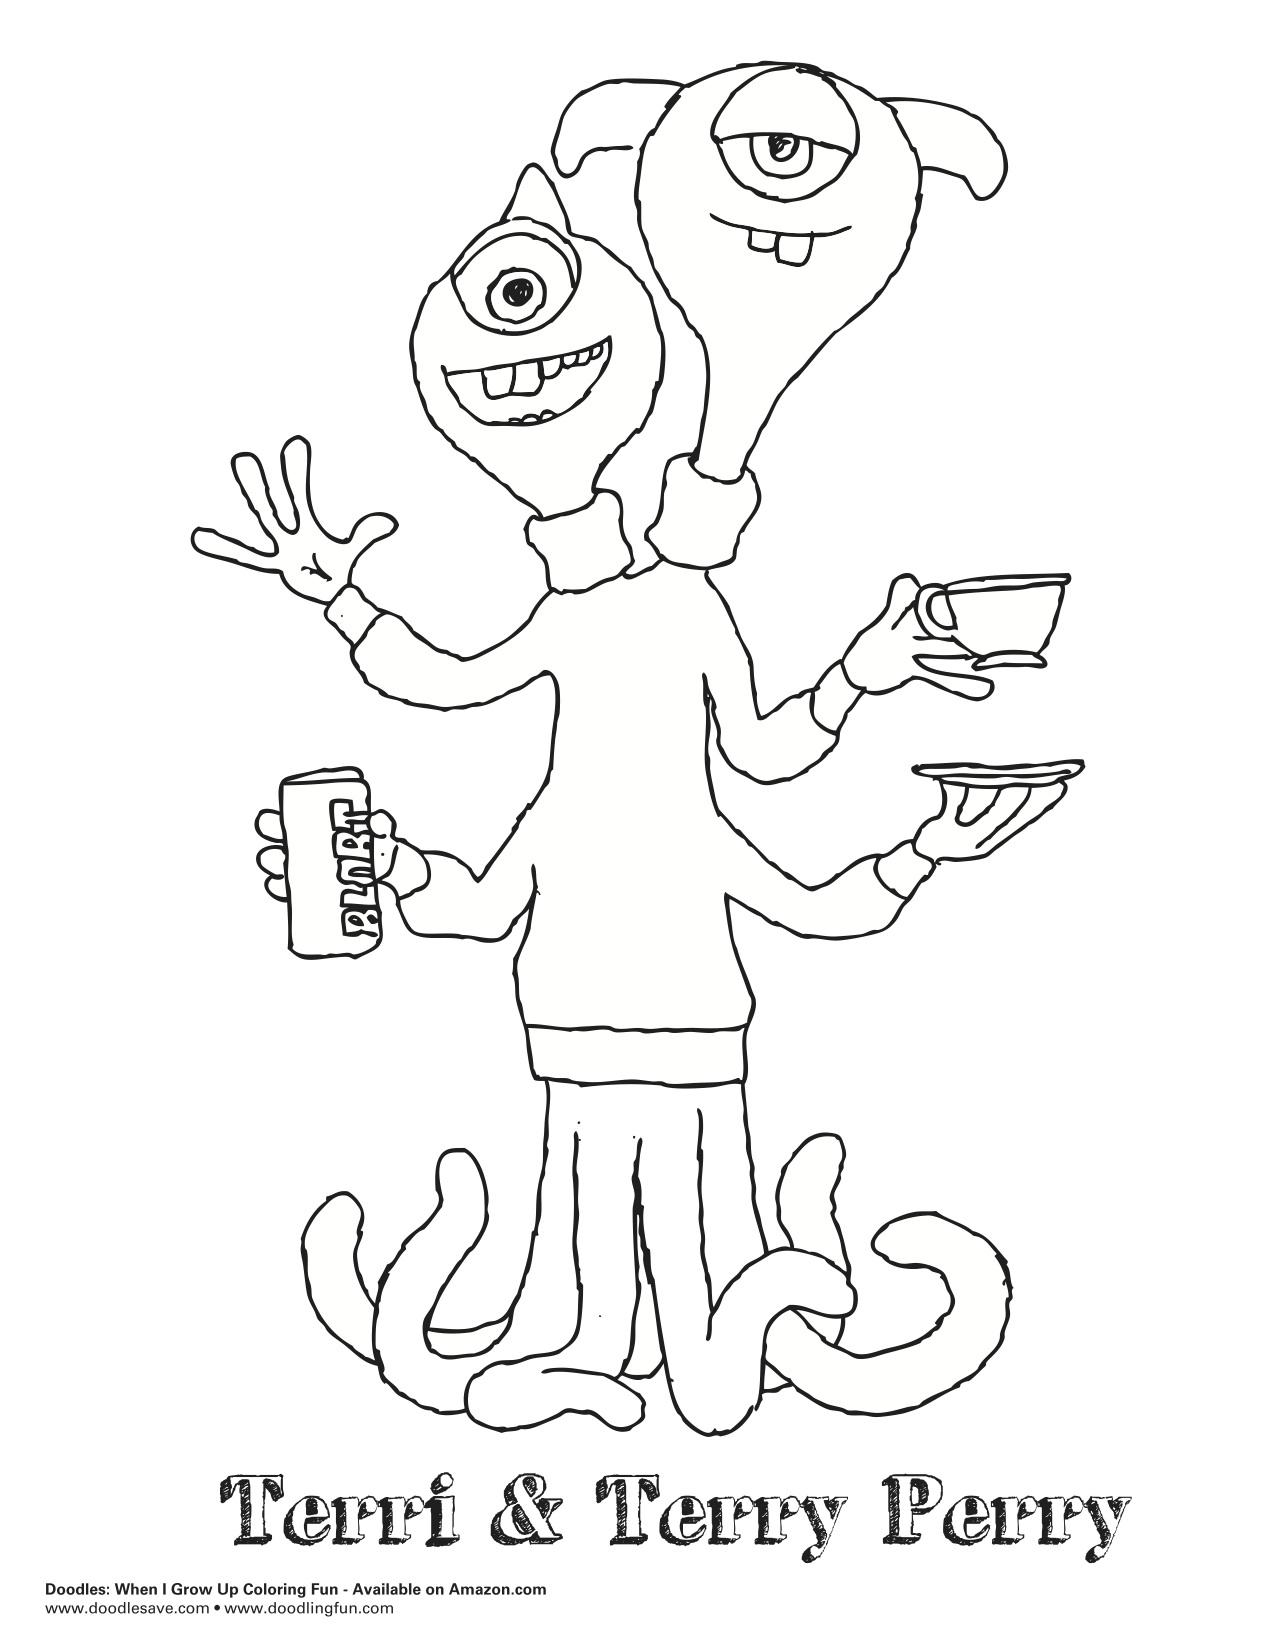 Monsters University Doodles Doodles Ave